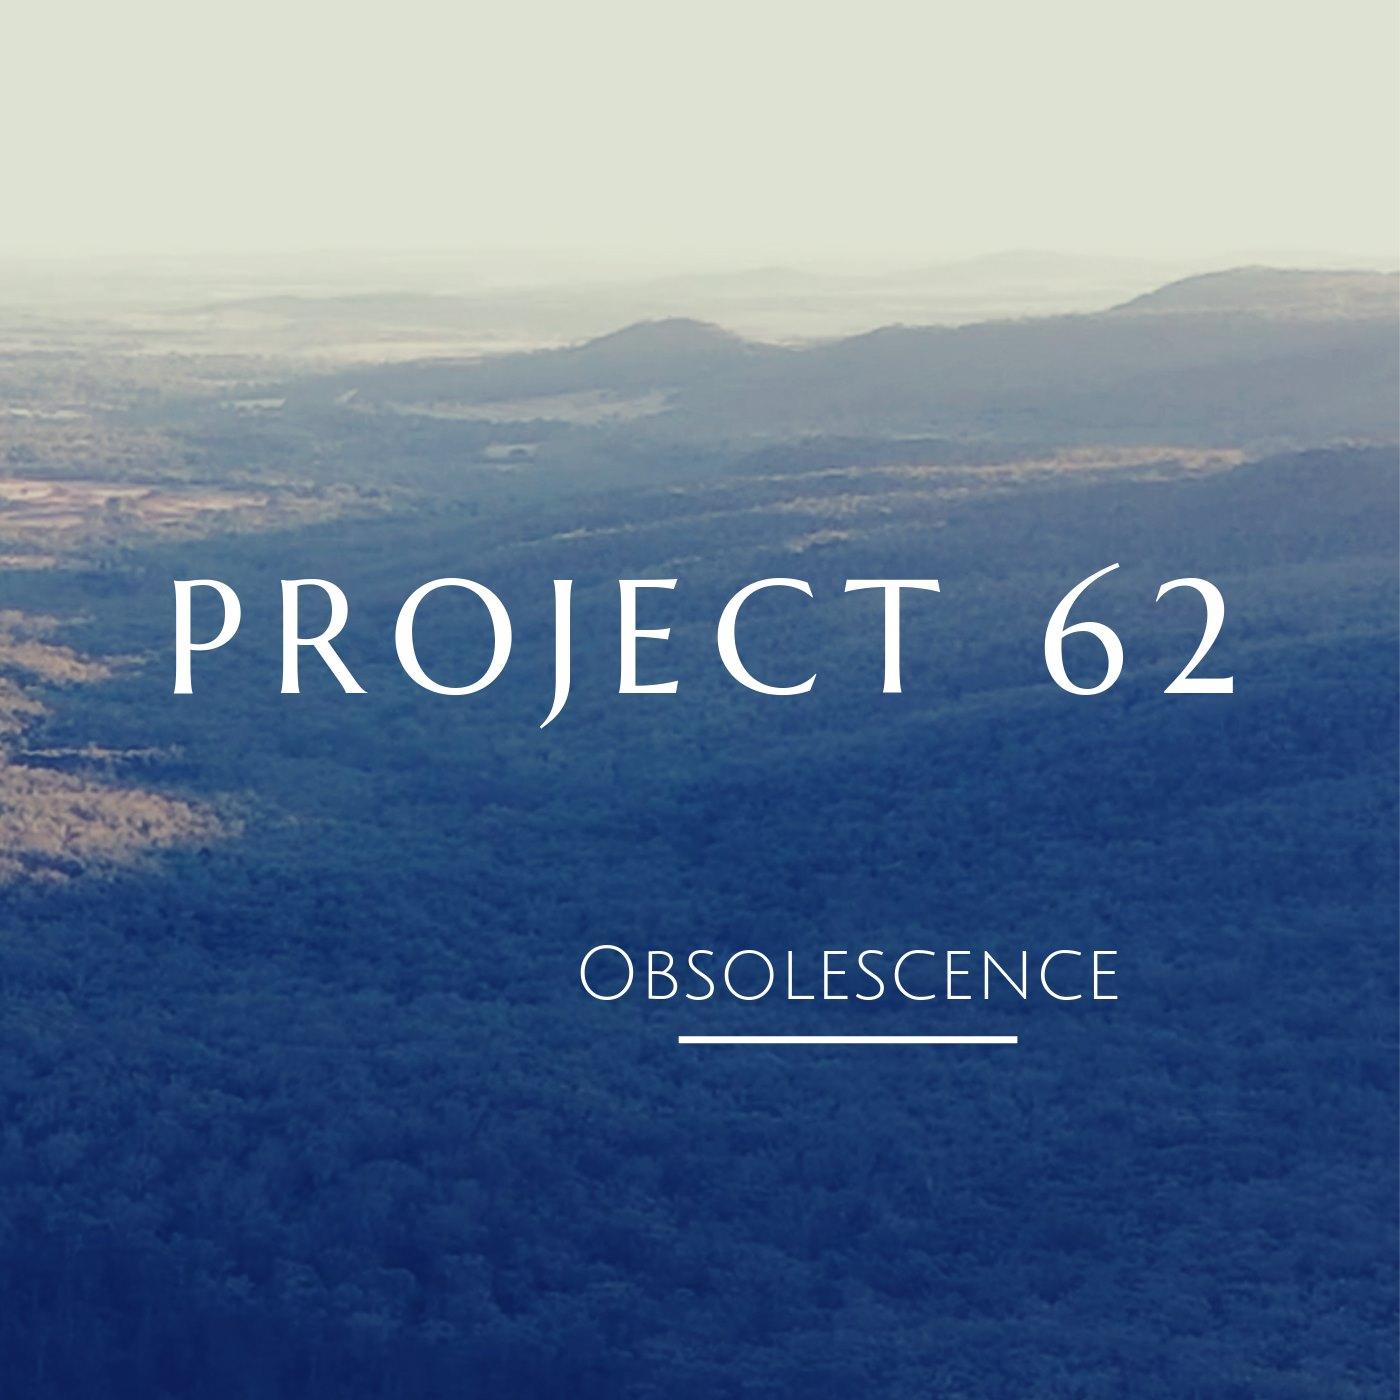 Project 62 Hiddenttalent.buzz